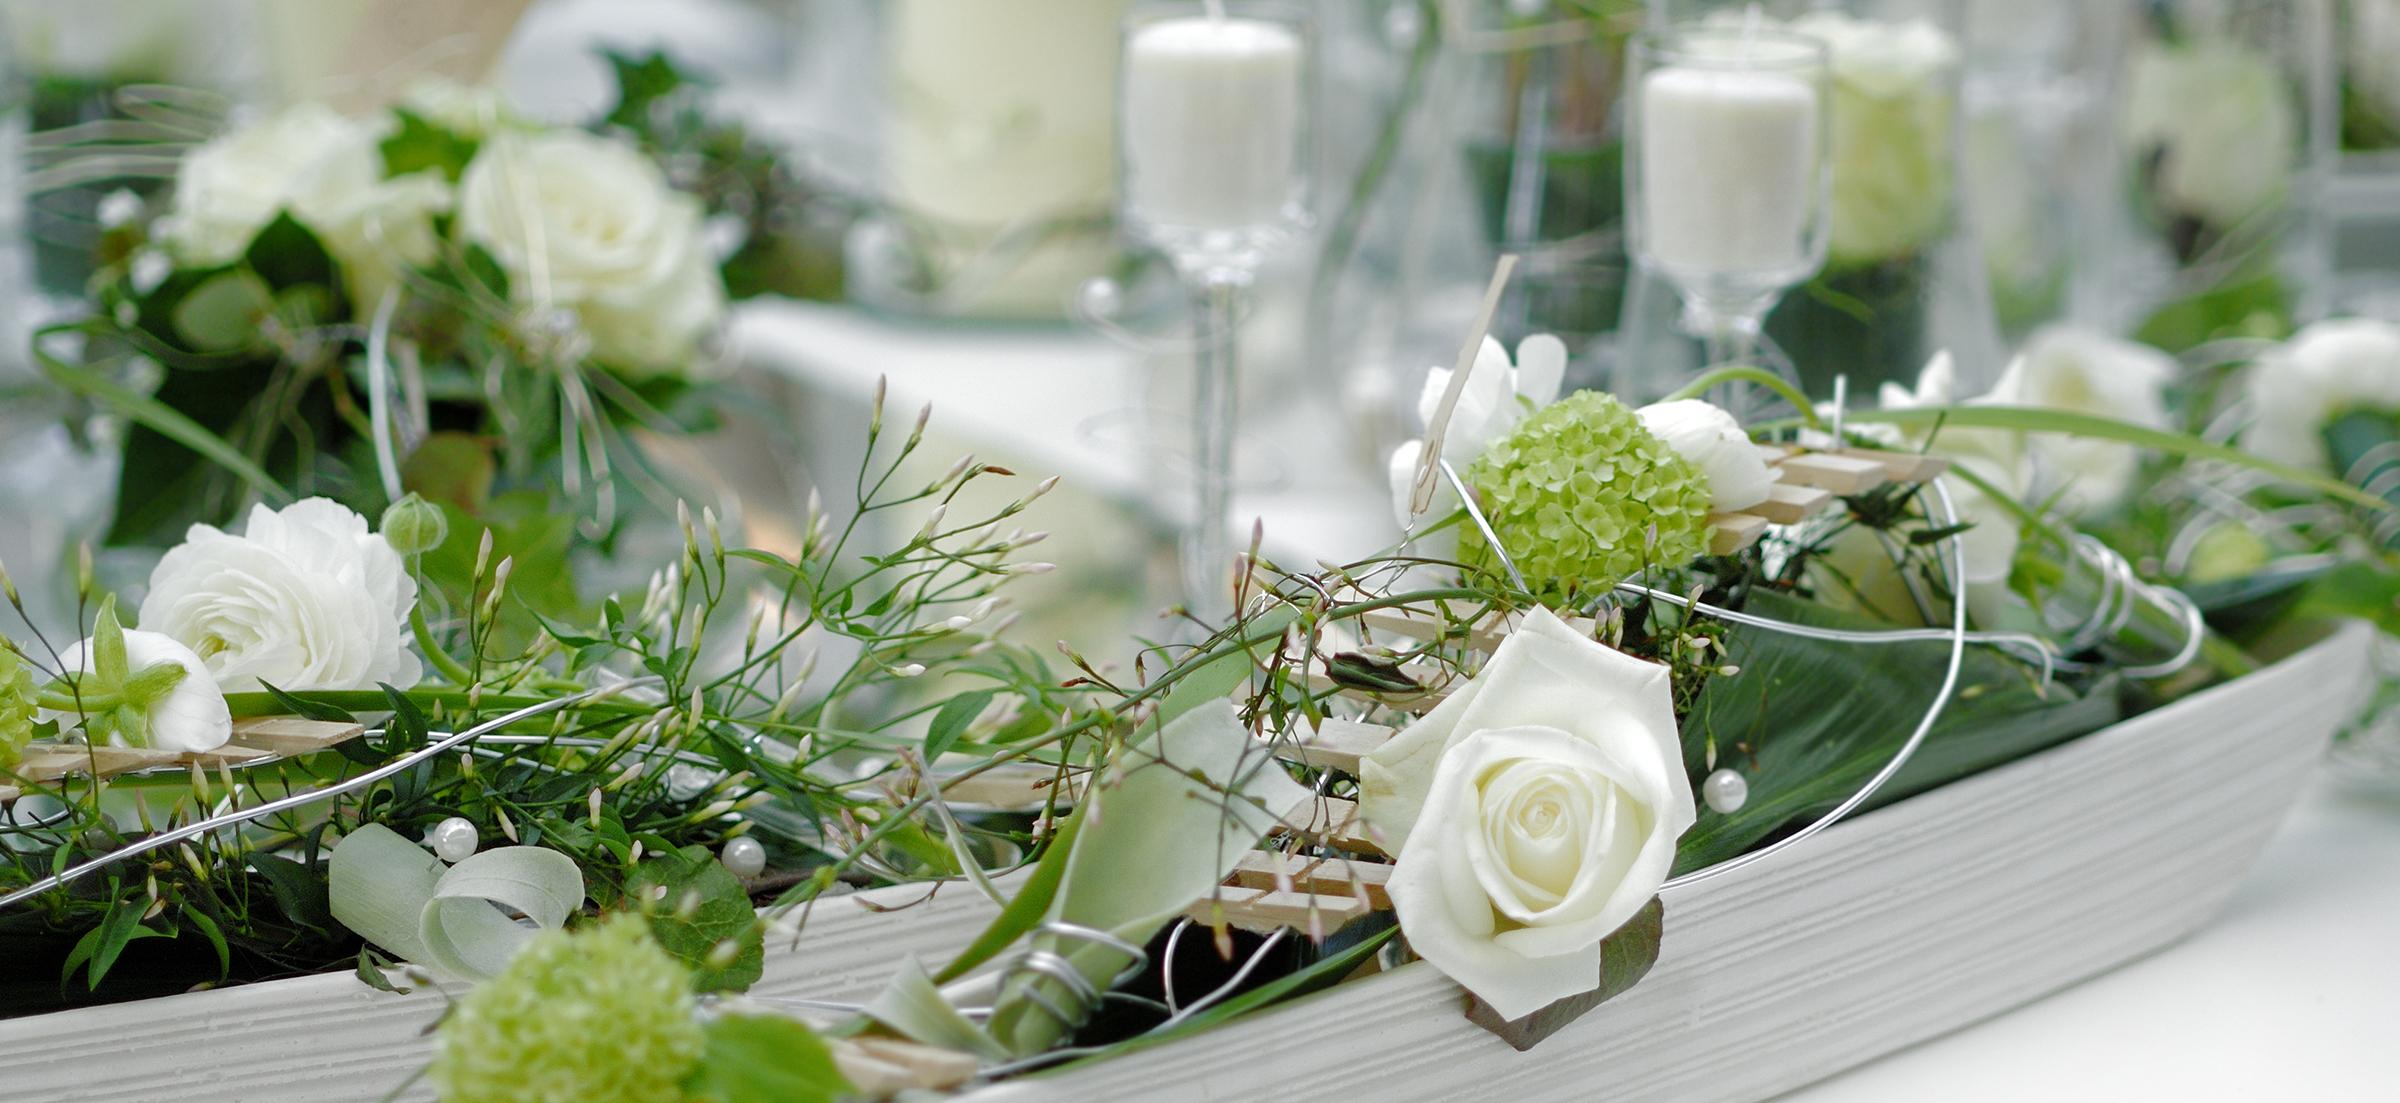 Wedding Fairs in Newbury